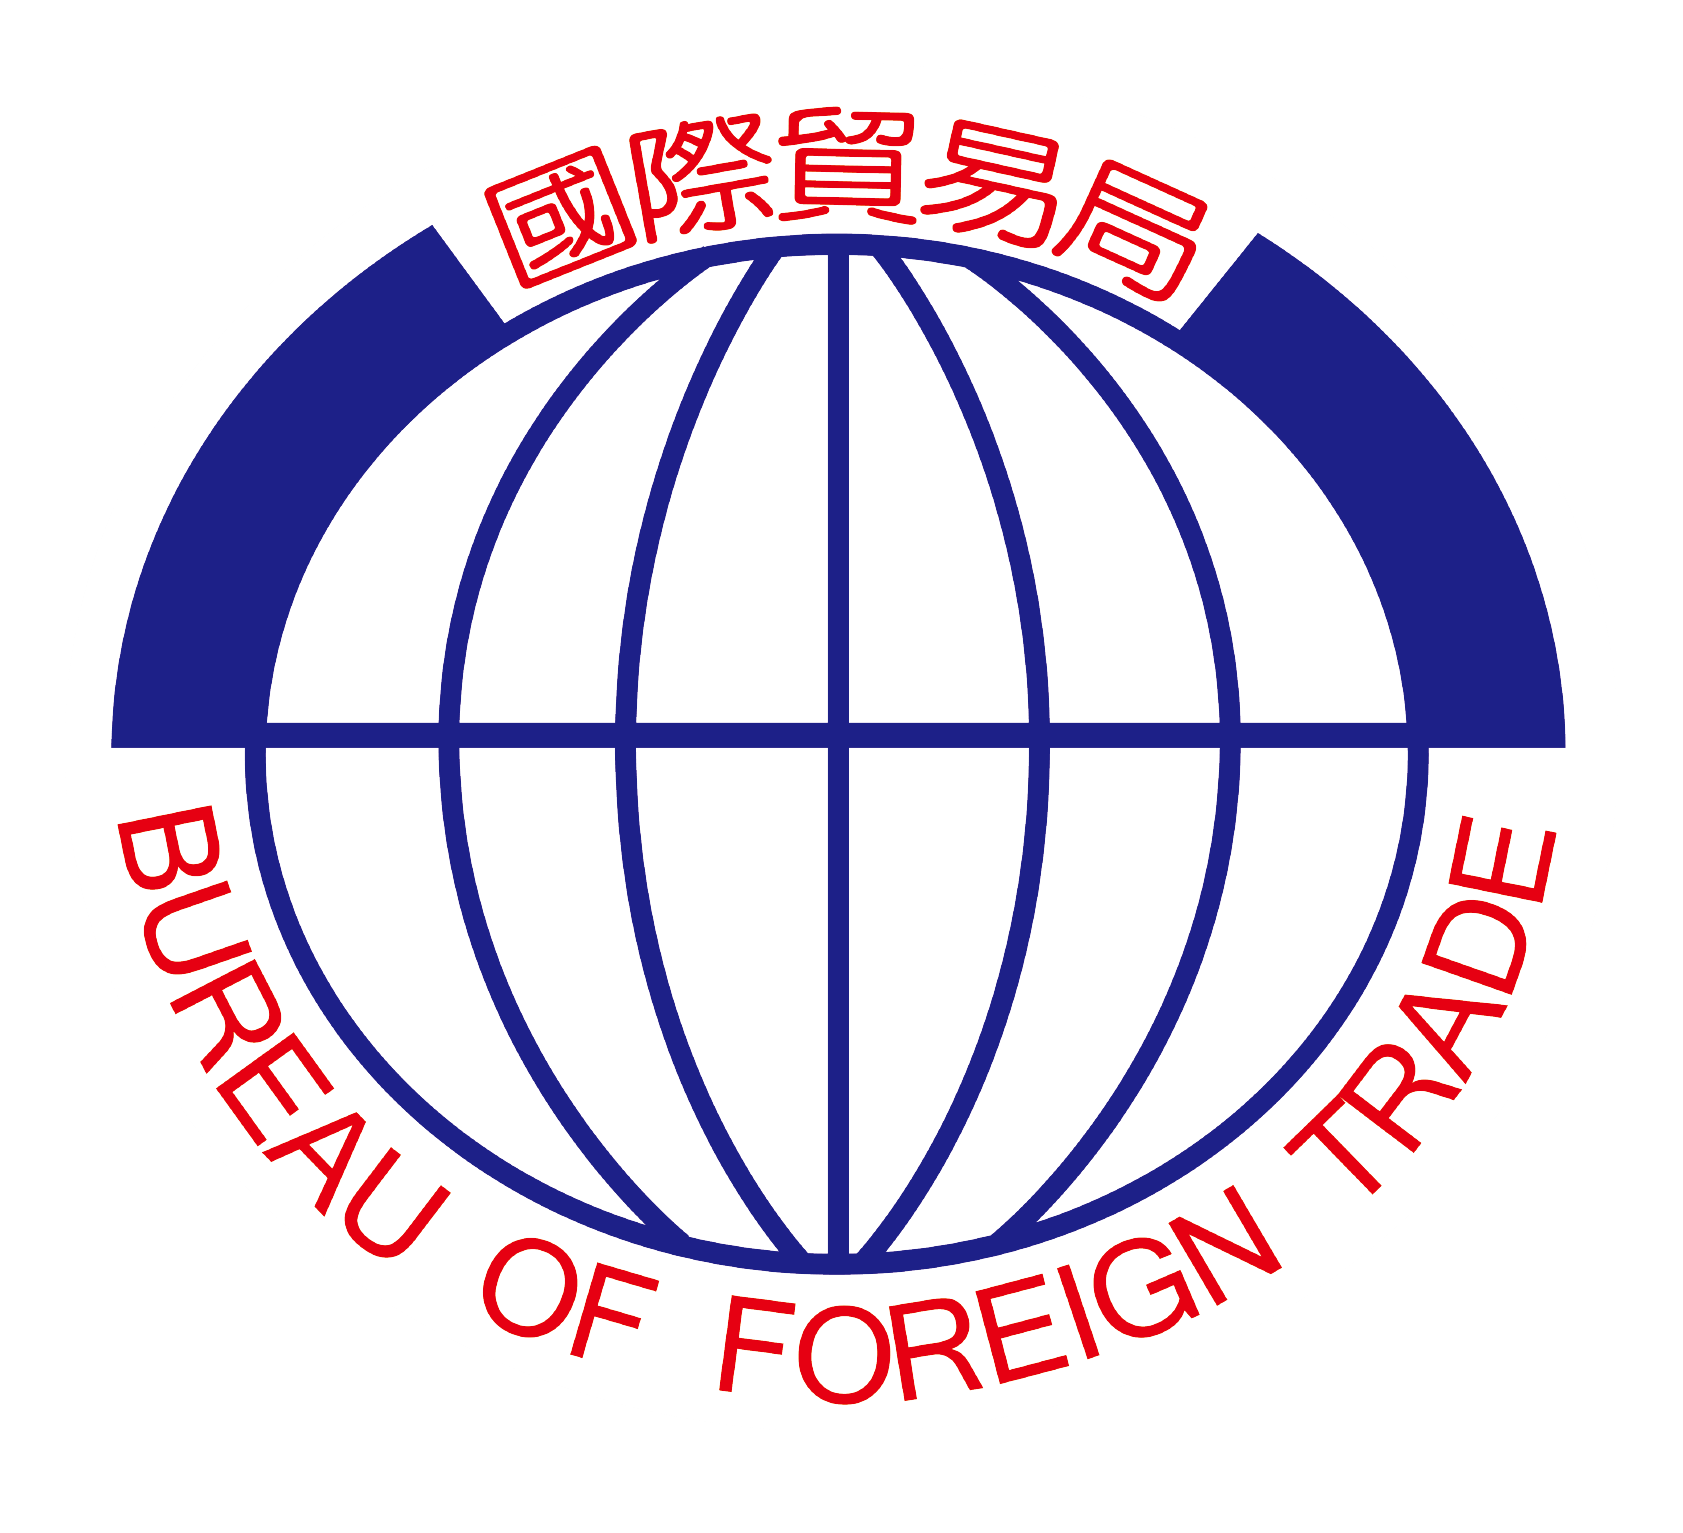 The Bureau of Foreign Trade, MOEA